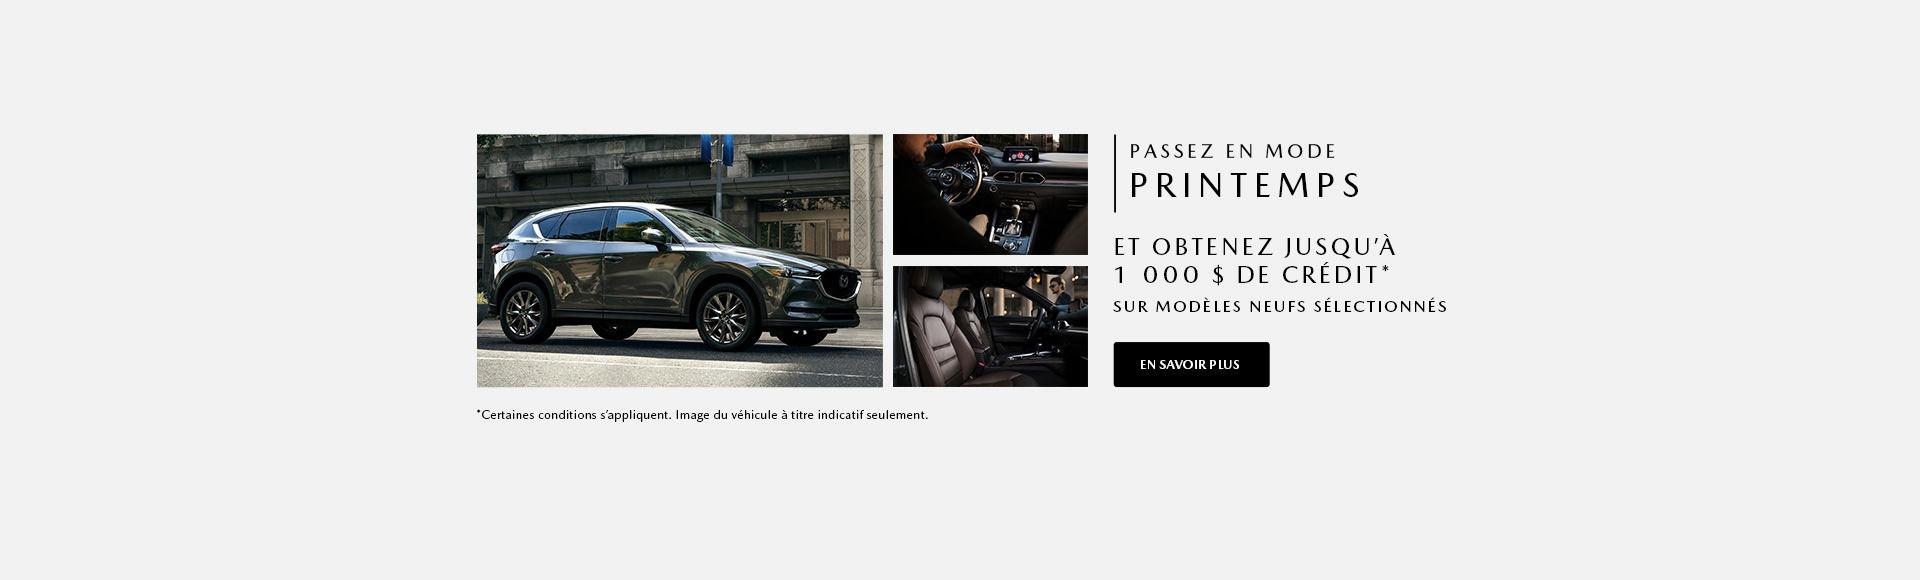 L'événement de Mazda!